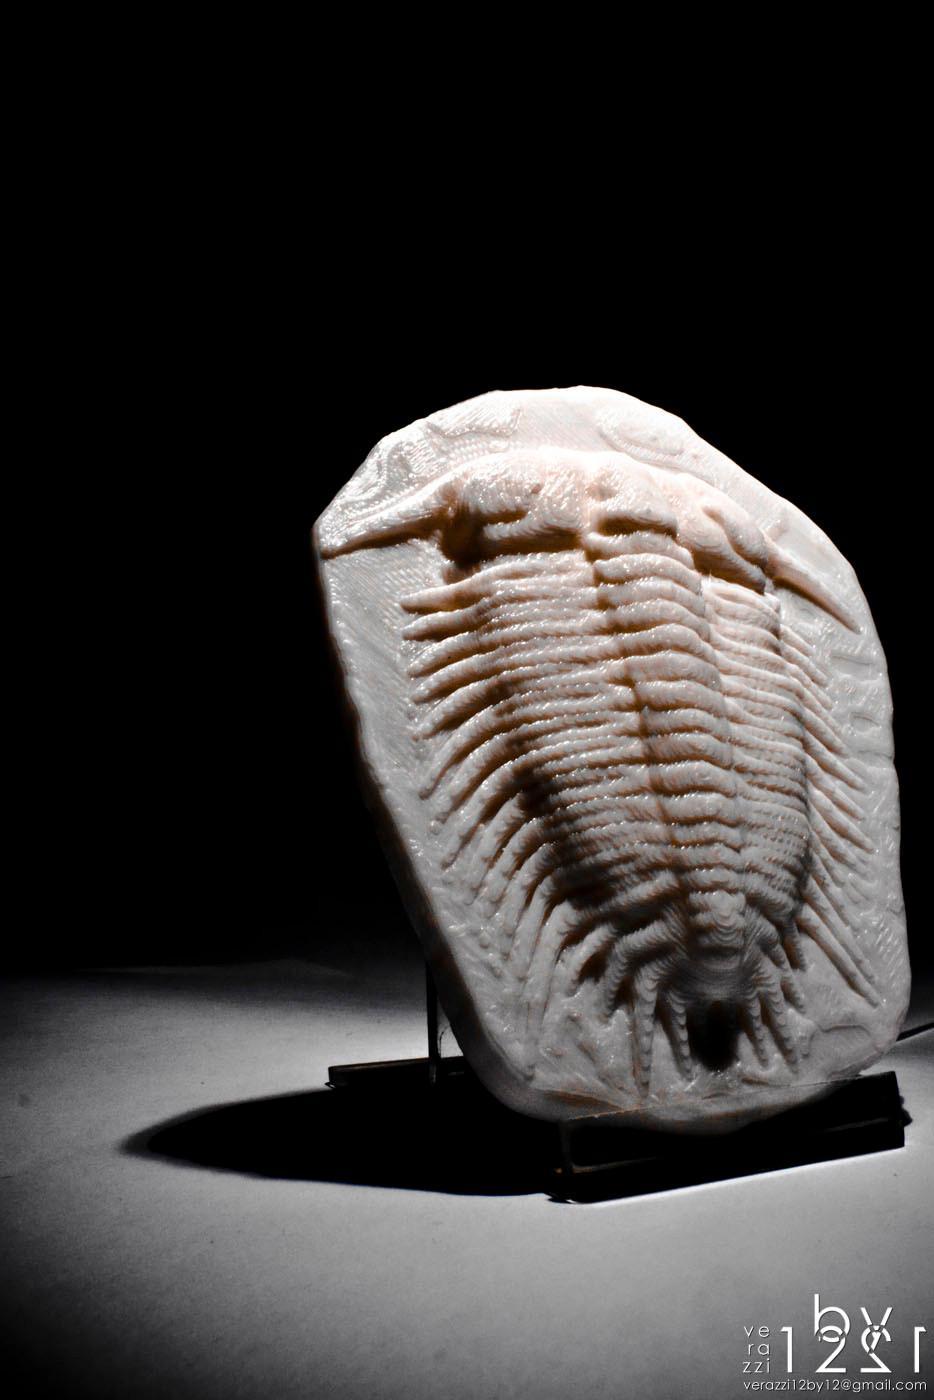 Damesella paronai trilobite 3D printing